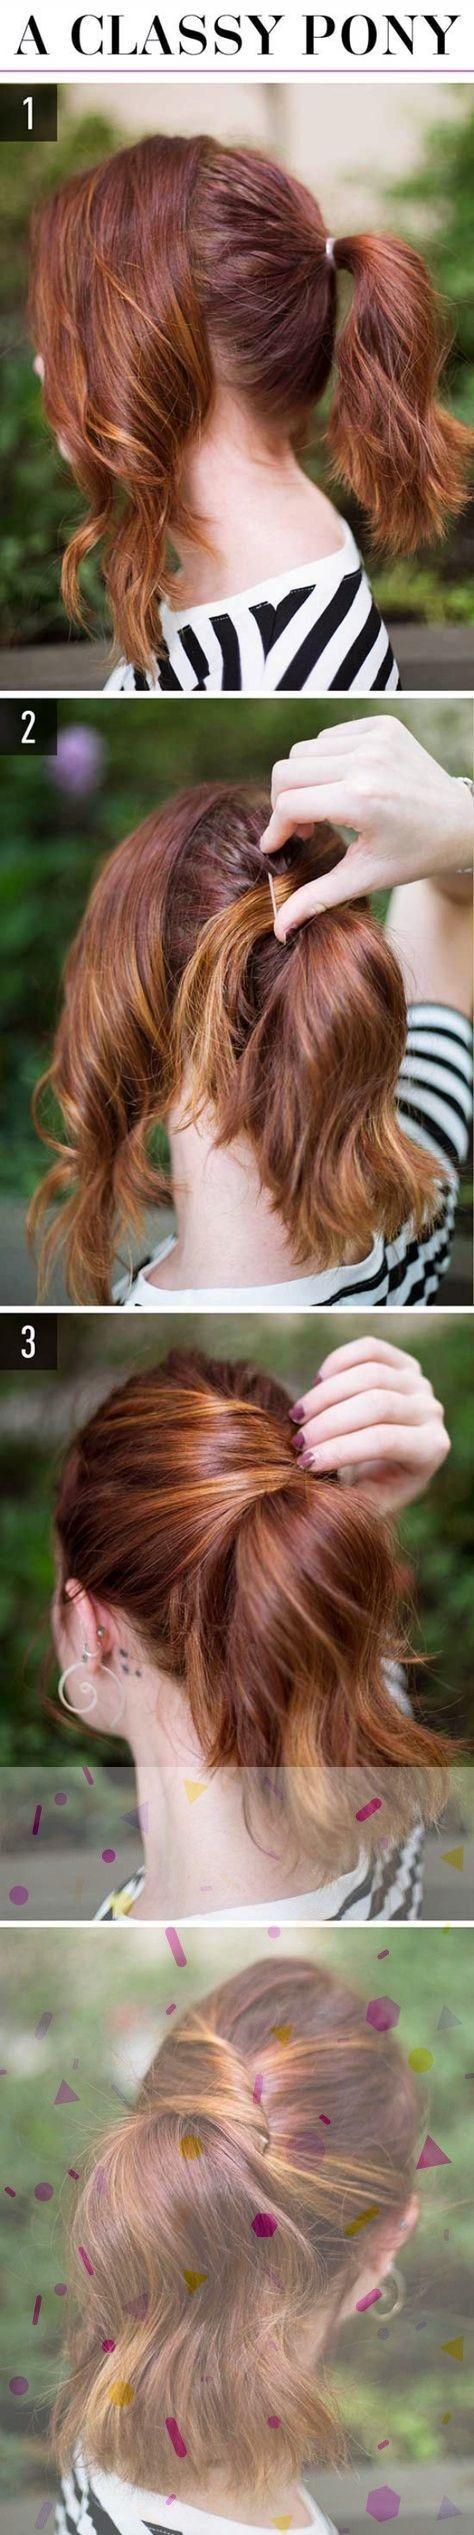 17+ Top-Notch Women Hairstyles Ponytail Ideas, #Hairstyles #Ideas #Ponytail #TopNotch #Women